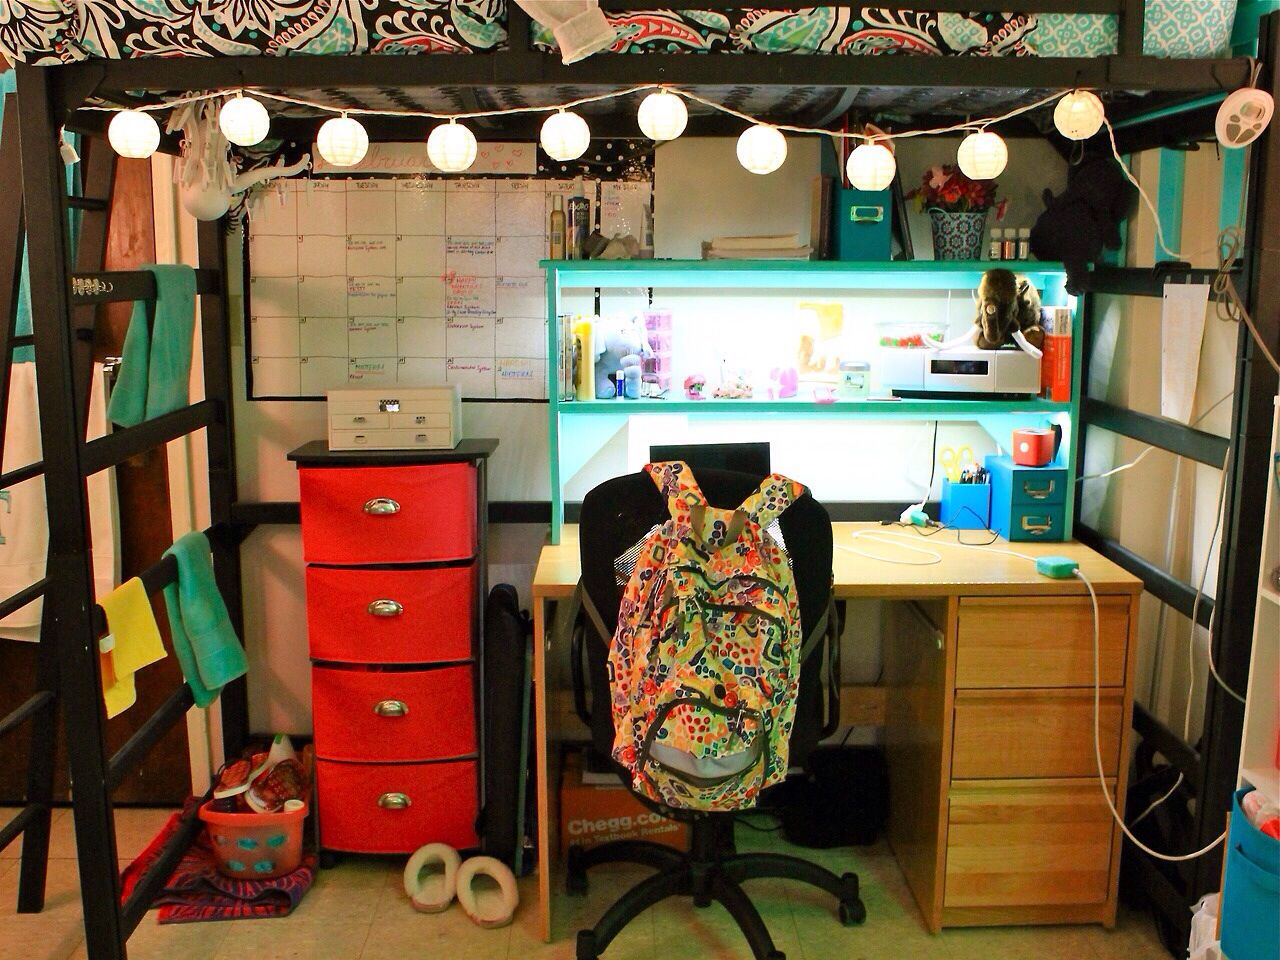 Medium Of College Room Setup